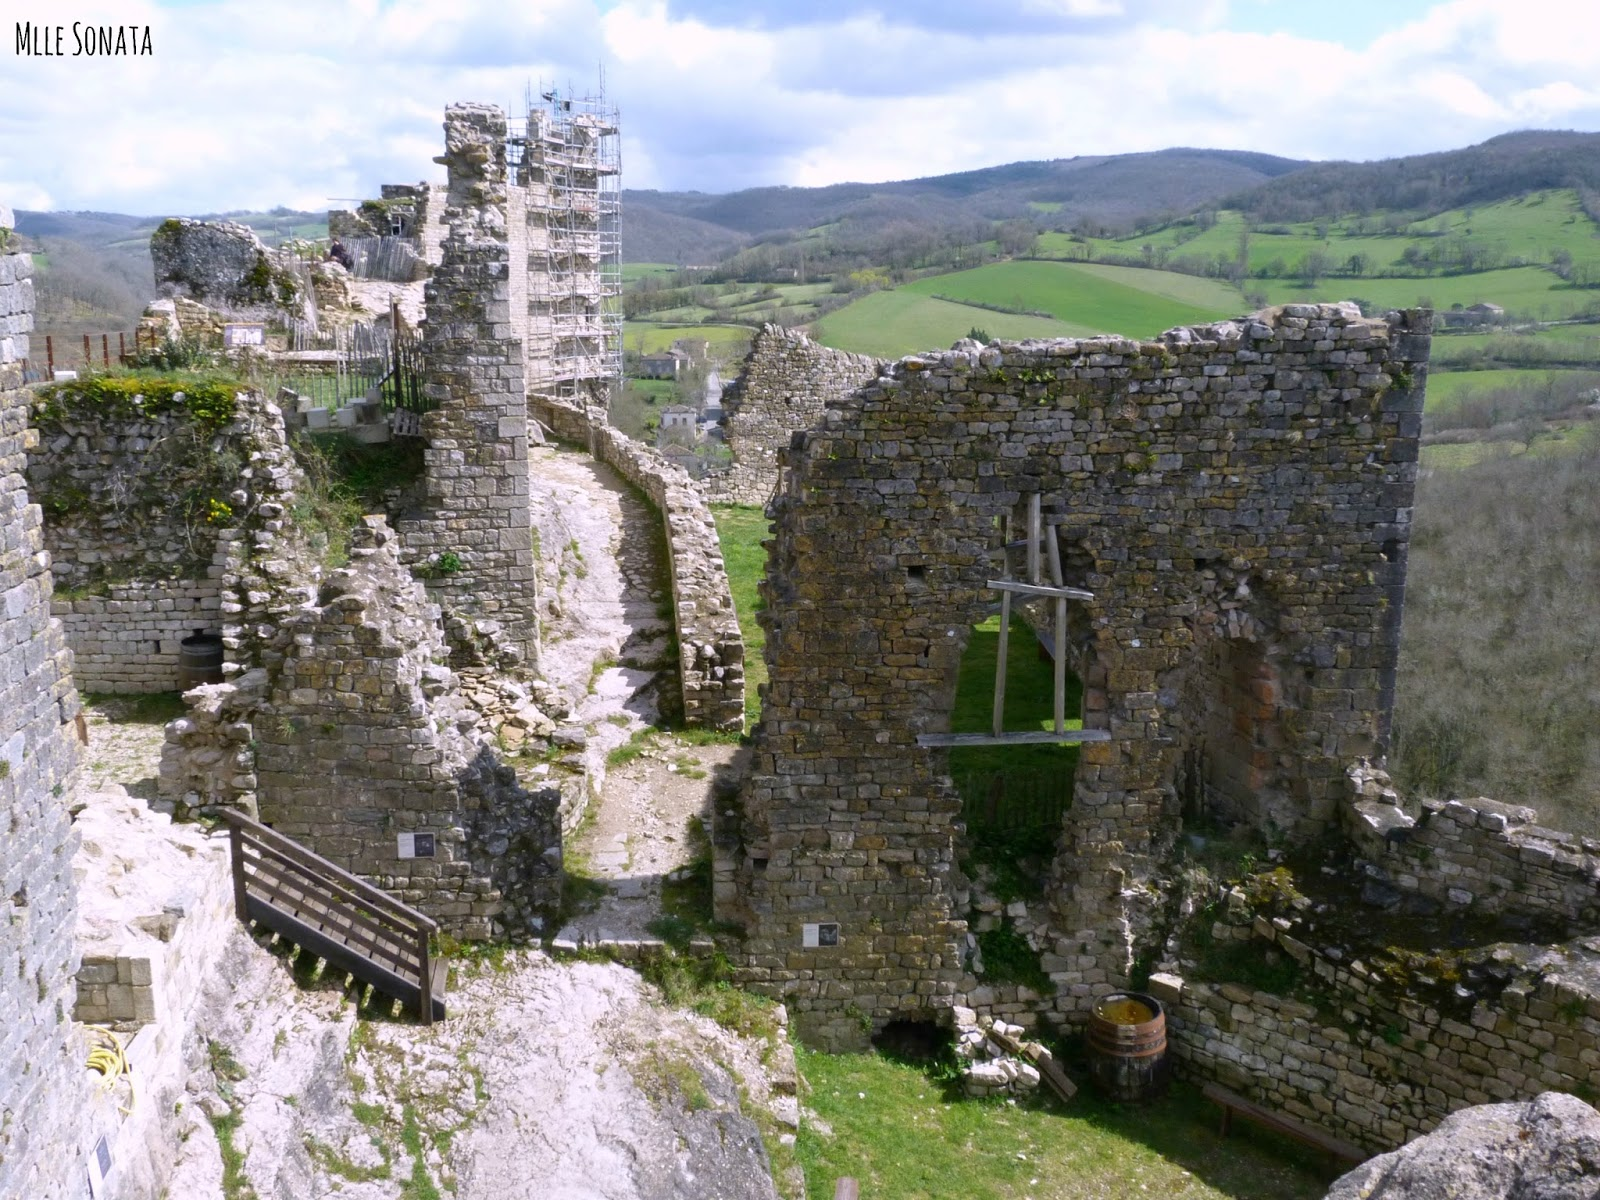 Château de Penne dans le Tarn